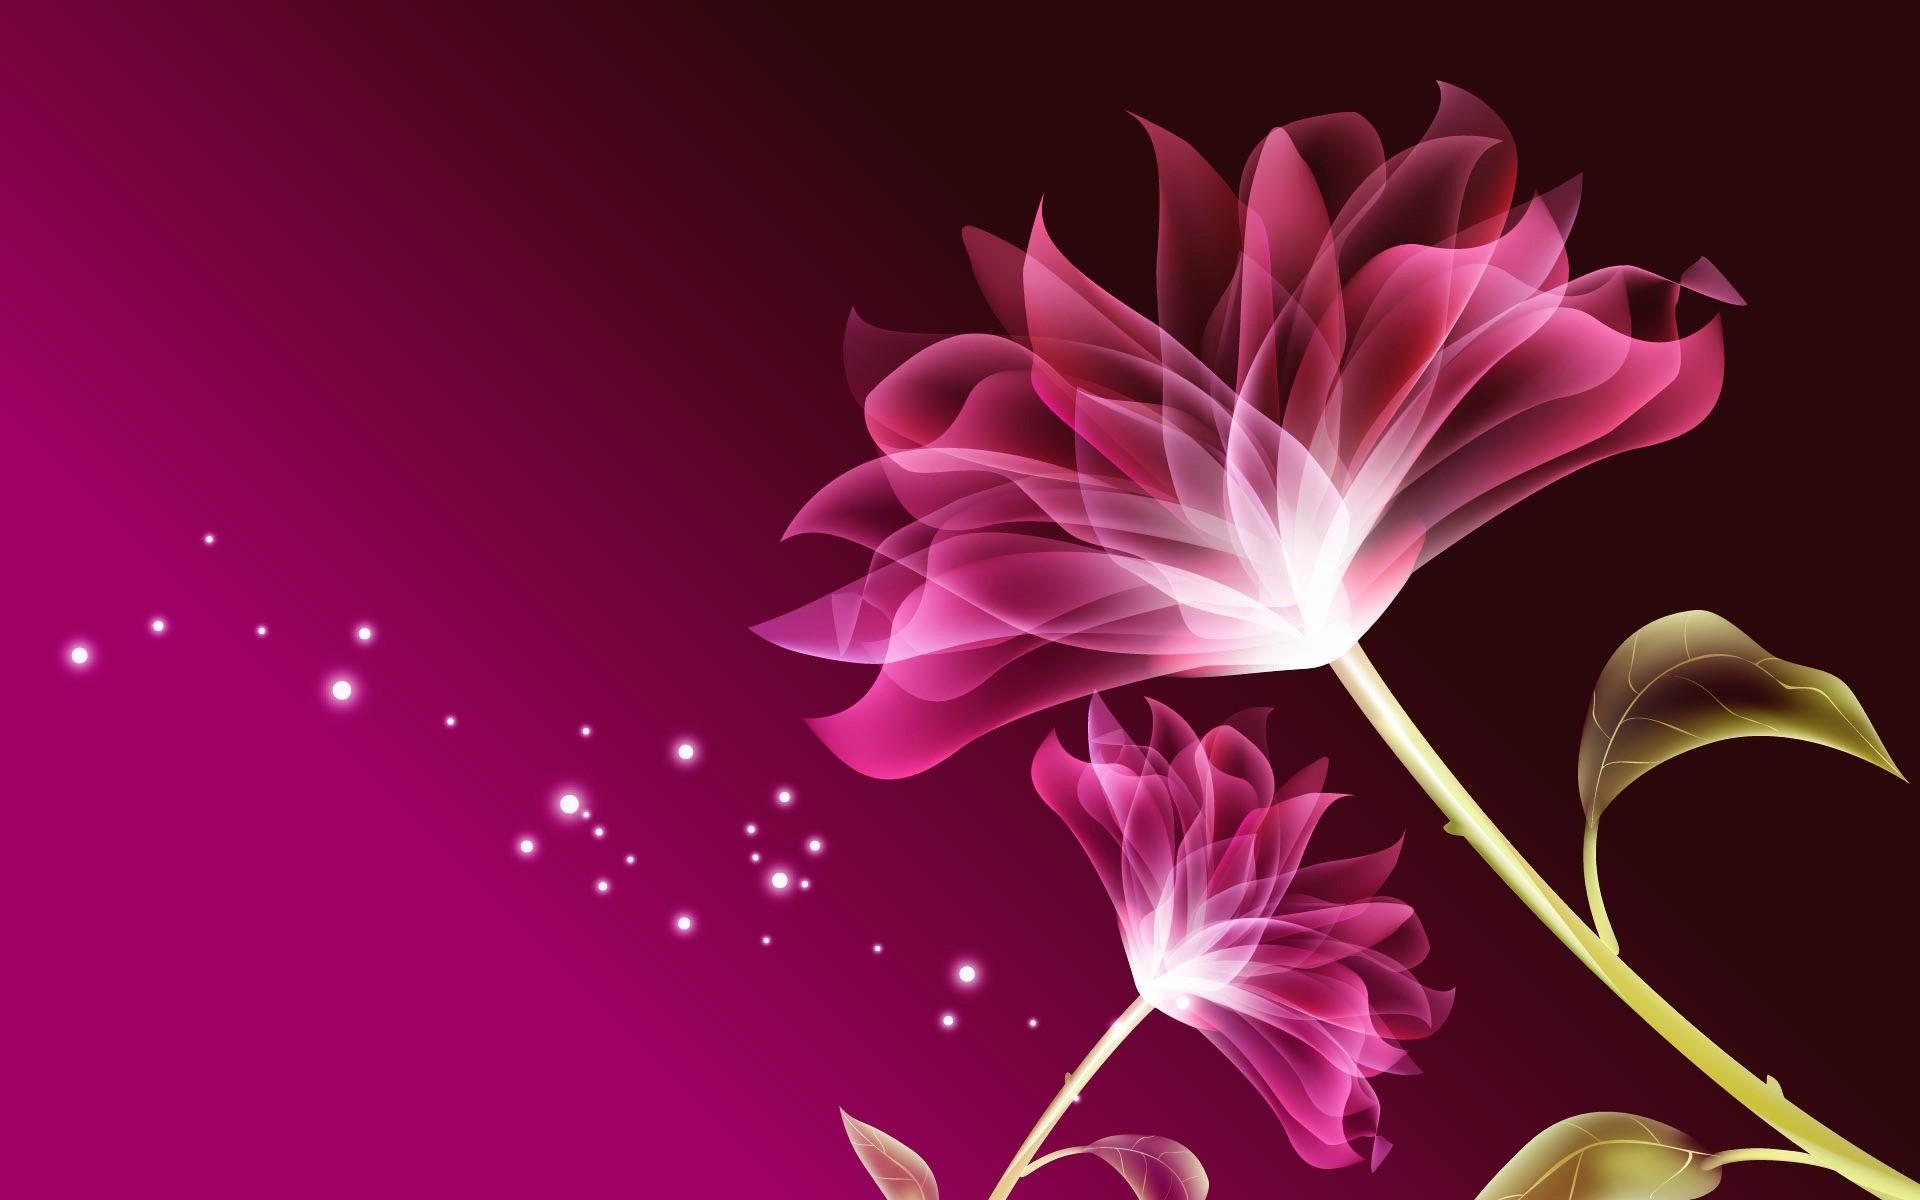 Фото на заставку телефона цветы